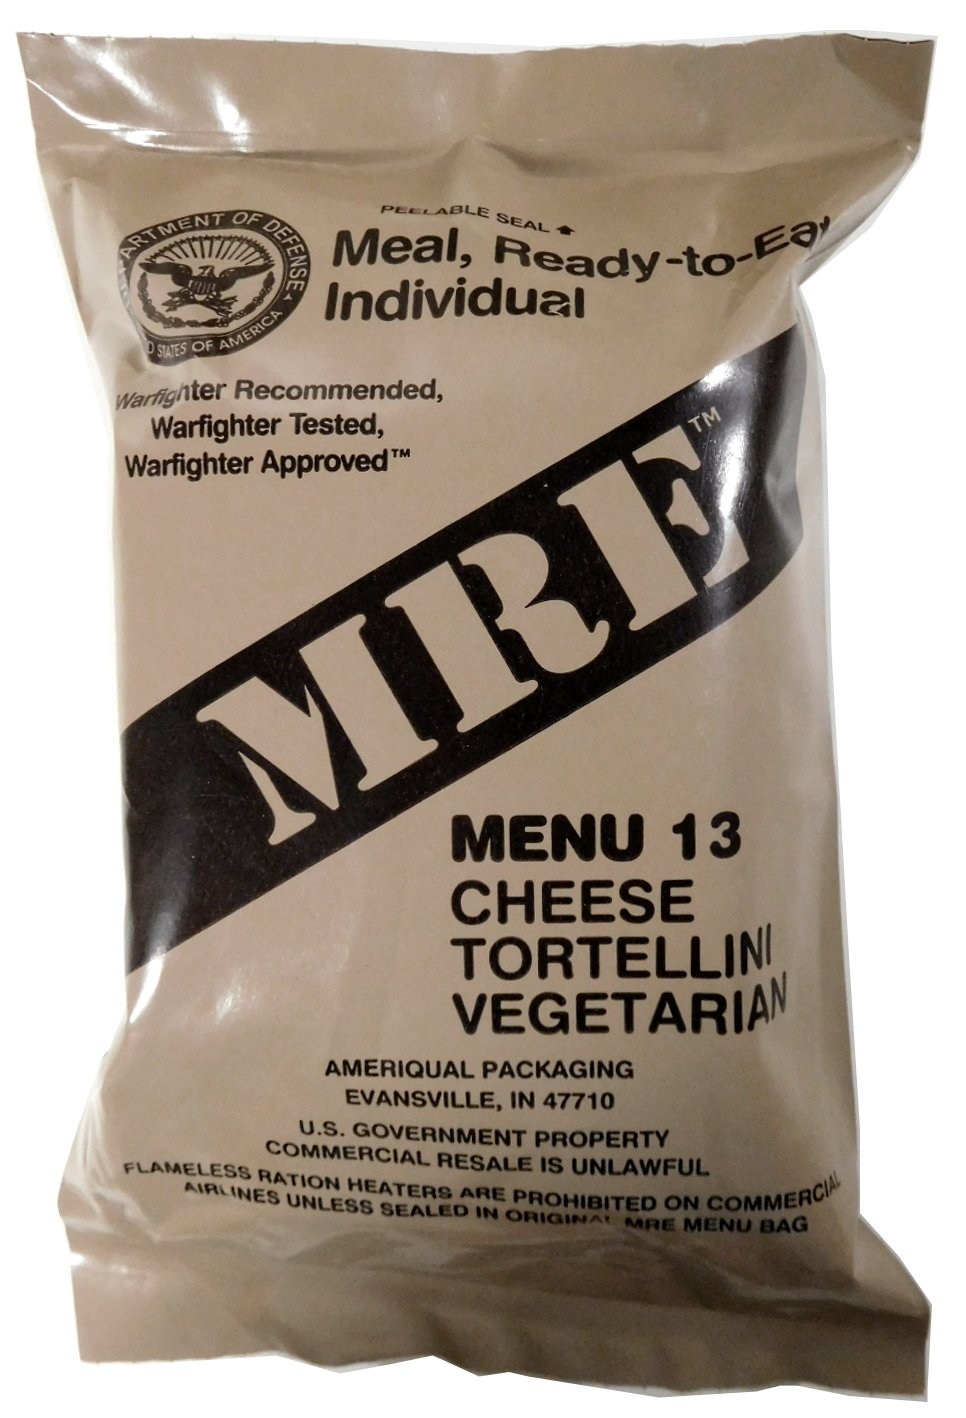 American MRE MENU 13 CHEESE TORTELLINI   2022 USA GENUINE ARMY RATION UP2.48